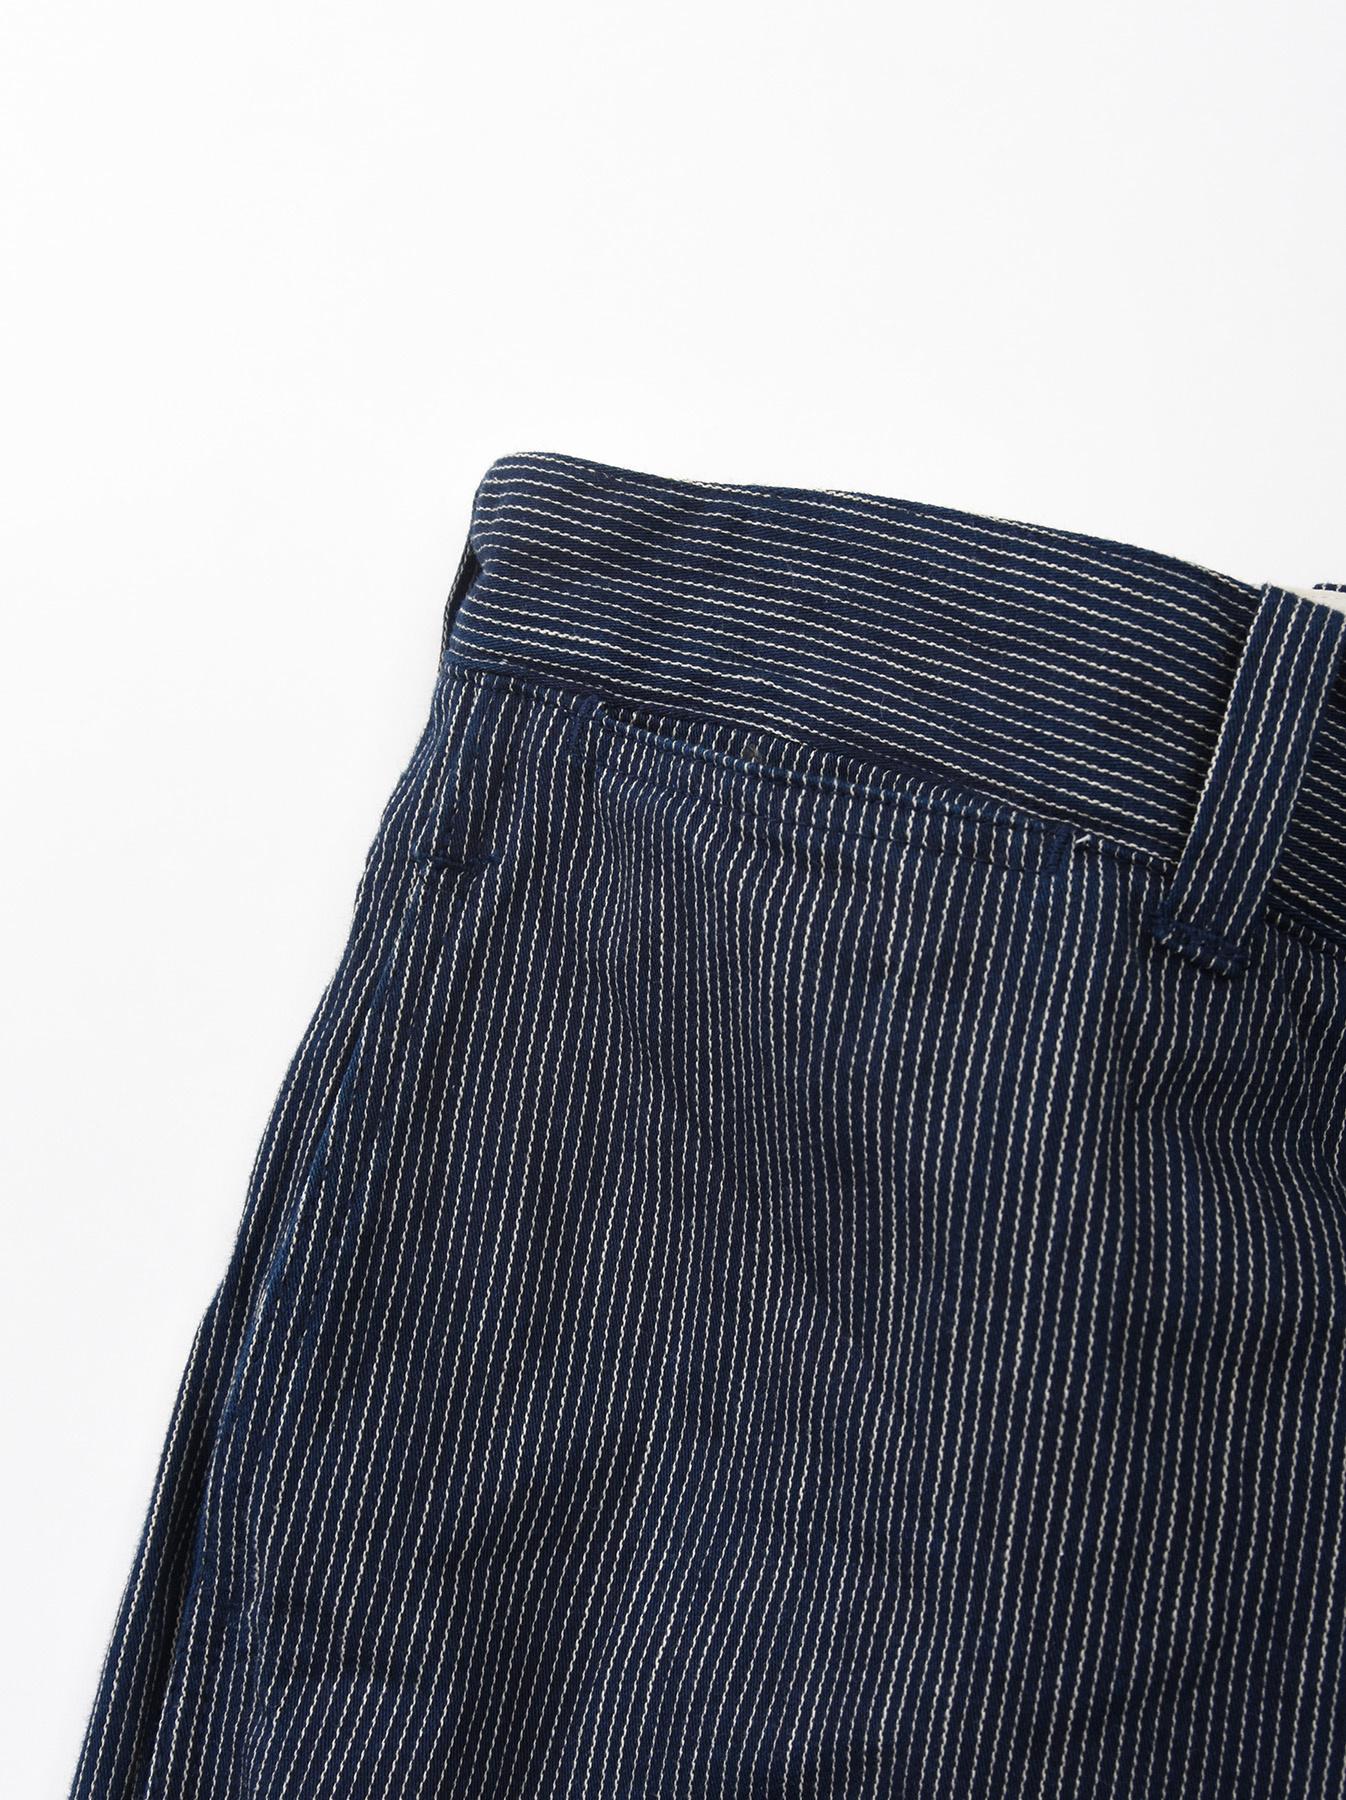 WH Indigo Mugi Yoko-shusi Work Pants-10